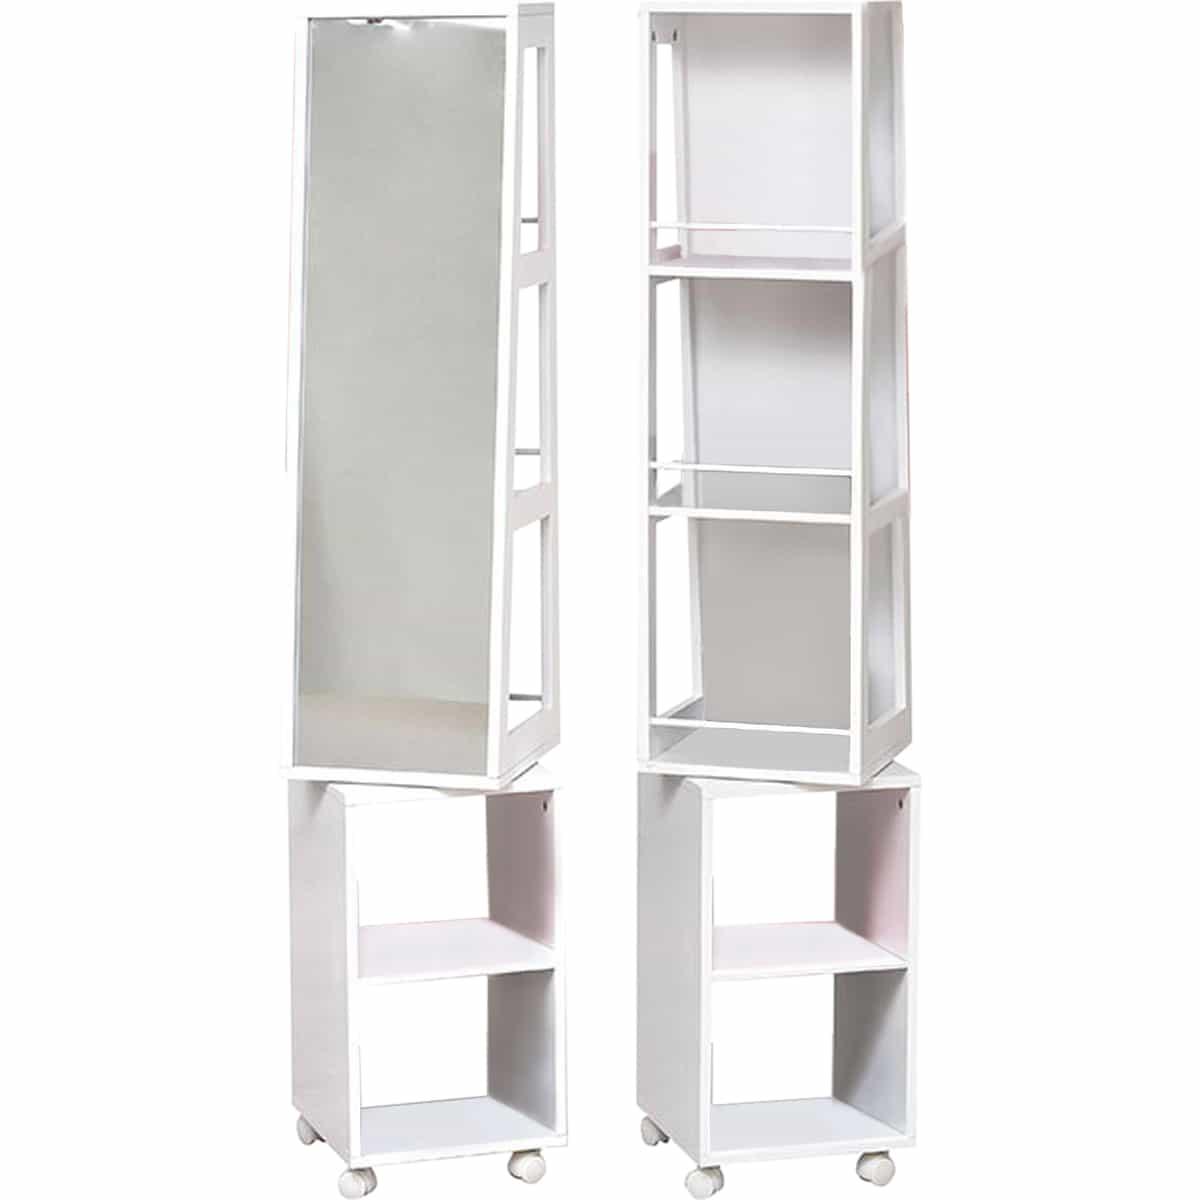 4goodz Badkamerkast / Spiegelkast staand draaibaar MDF 30x30x155 cm - Wit